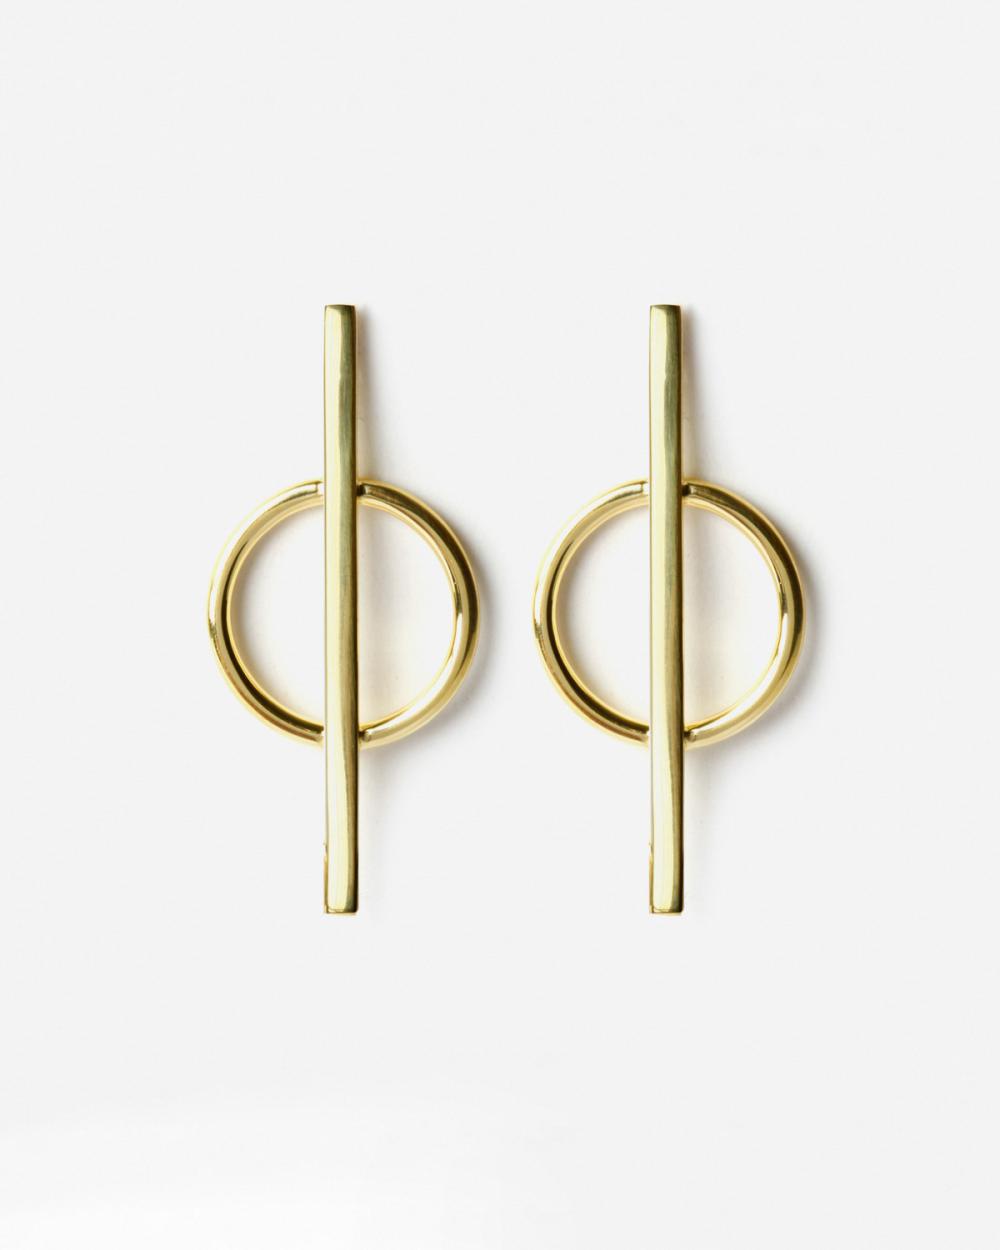 Earrings YELLOW GOLD PHI EARRINGS NOVE25